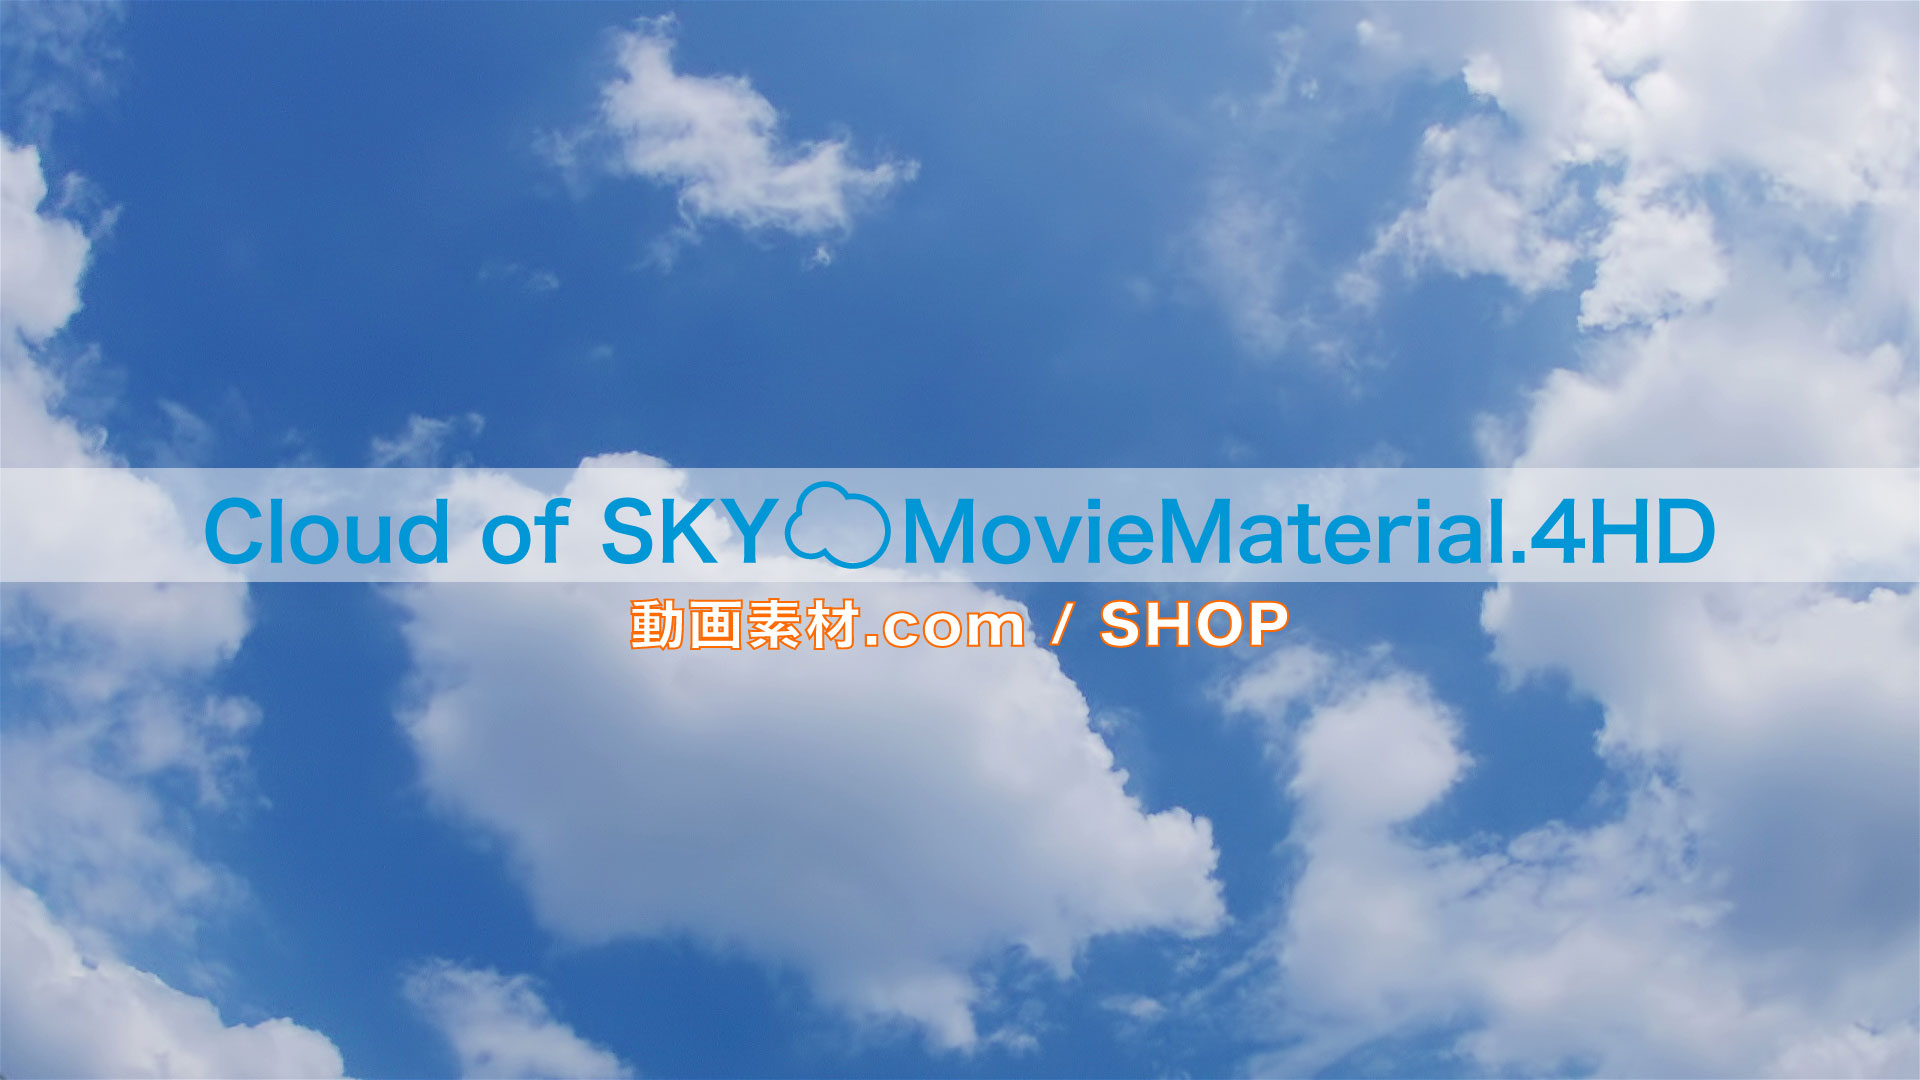 Cloud of SKY MovieMaterial.4HD 空と雲フルハイビジョン1920×1080p映像素材集image4